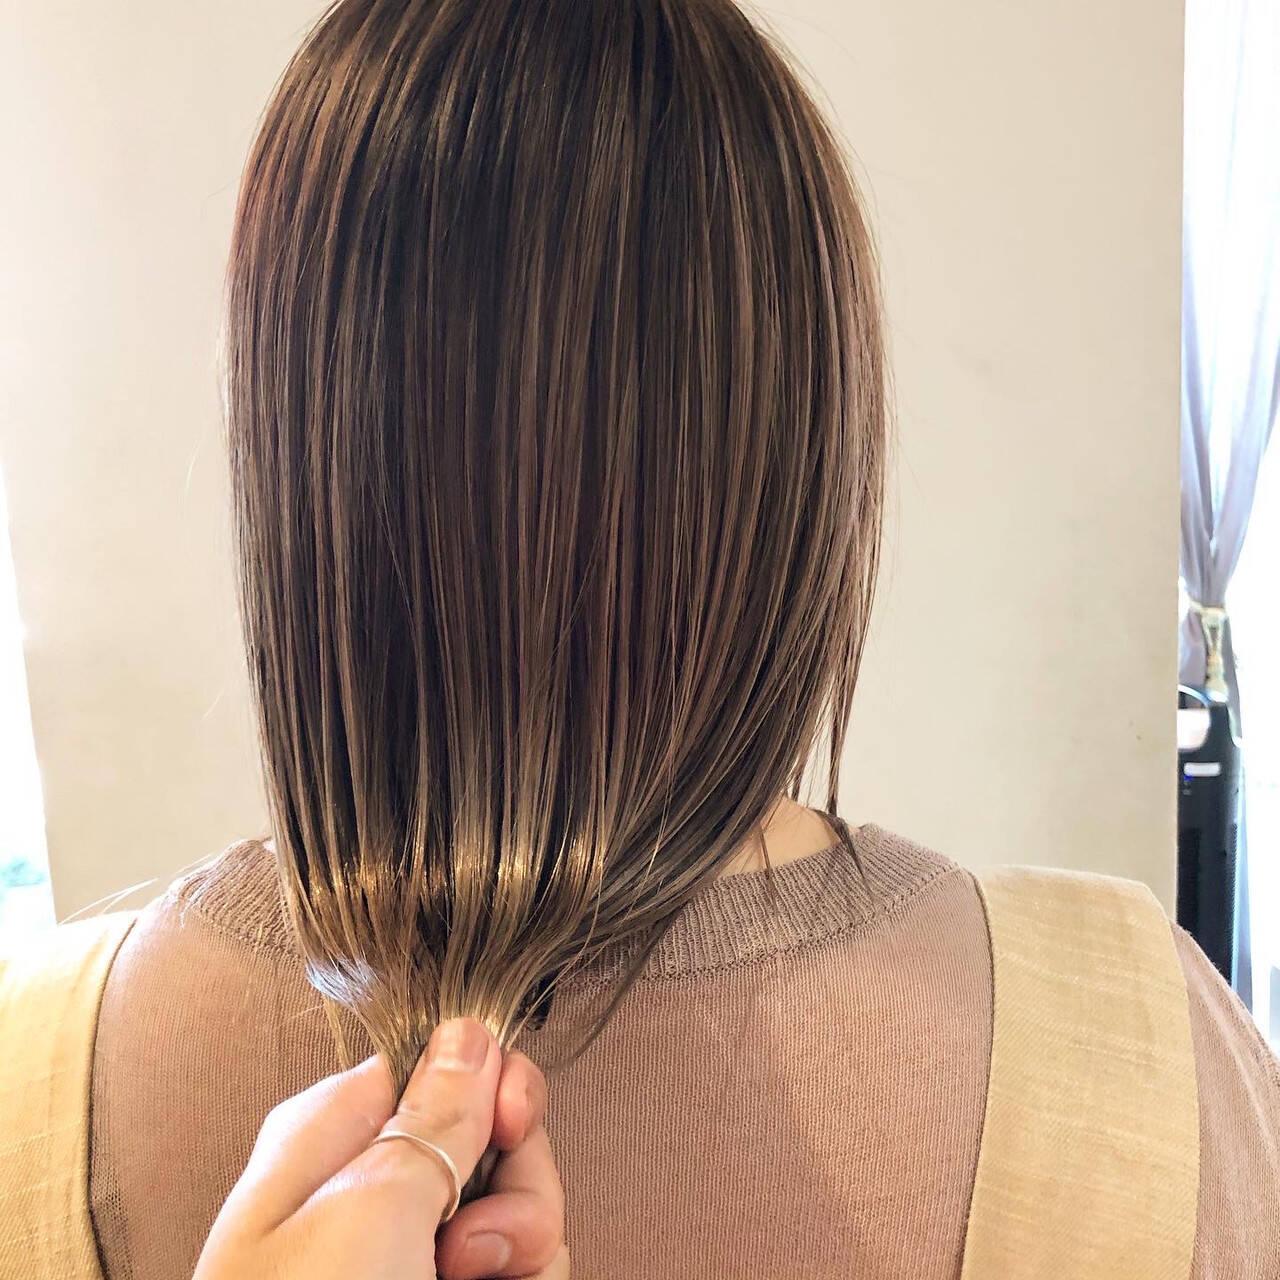 3Dハイライト 極細ハイライト ナチュラル 大人ハイライトヘアスタイルや髪型の写真・画像